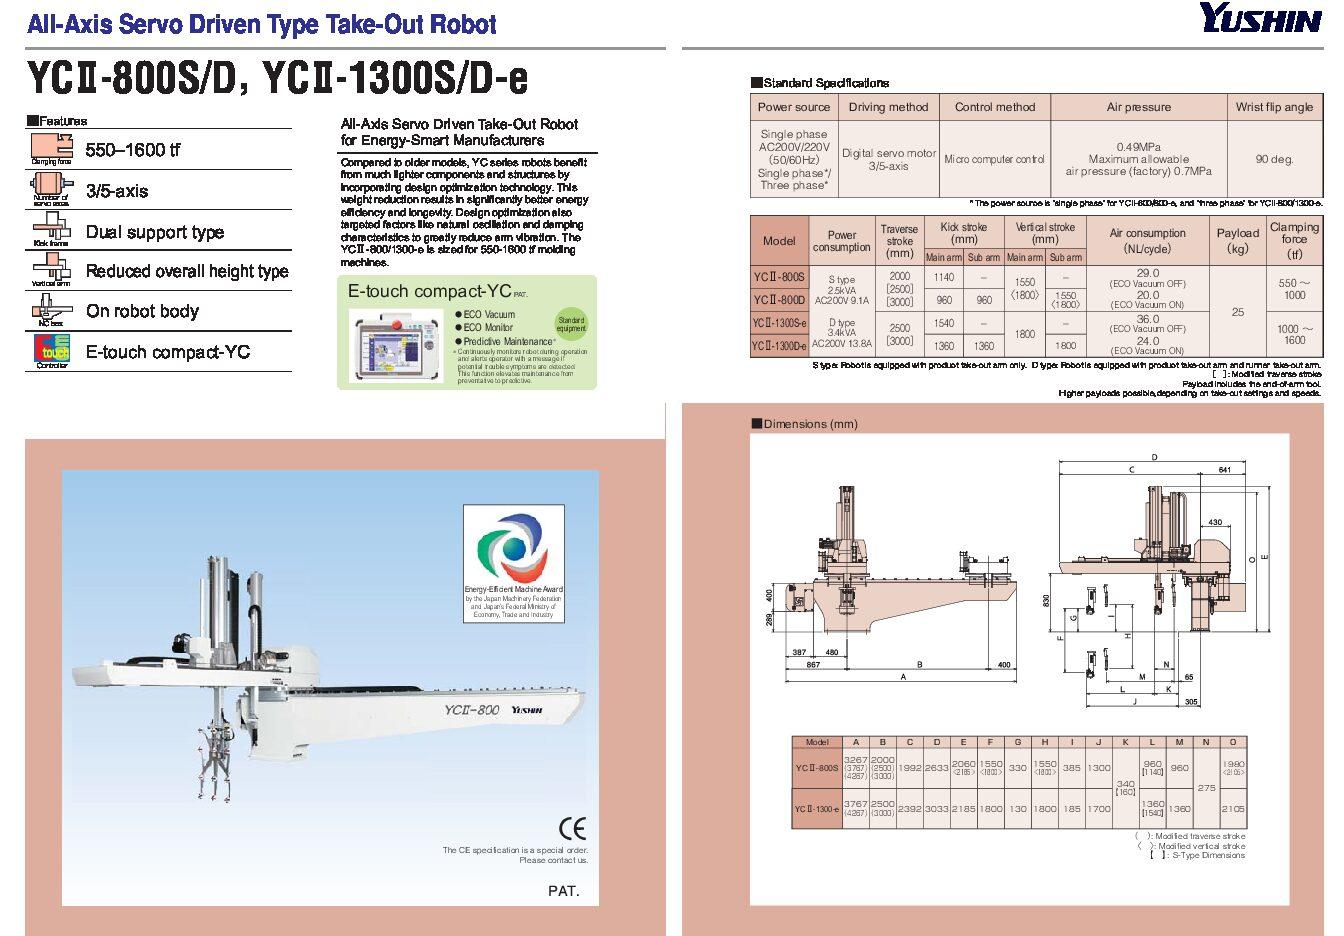 yc2 800sd1300sde en pdf